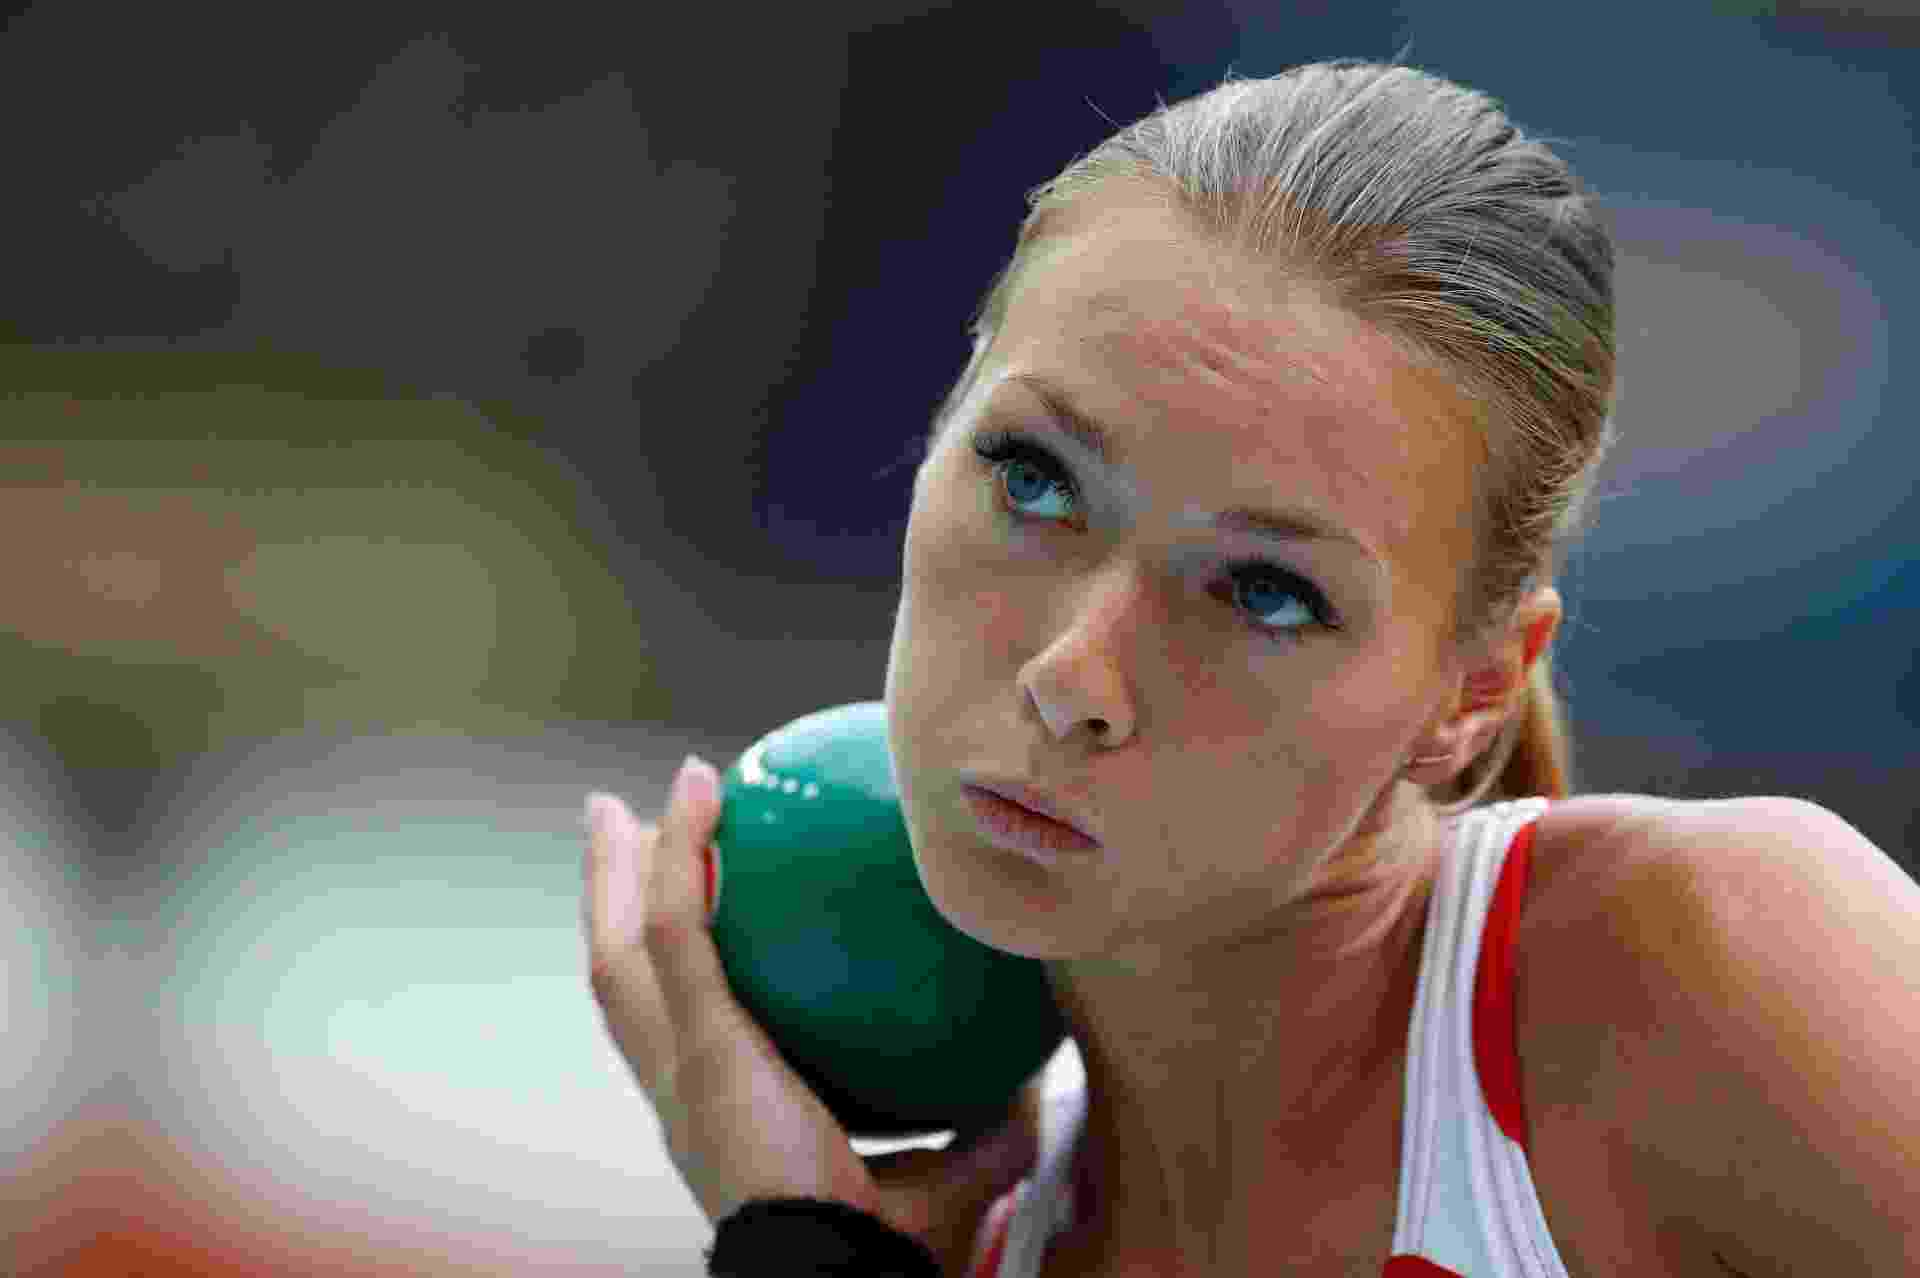 12.ago.2013 - Laura Ikauniece, da Letonia, disputa prova do arremesso de peso no heptatlo - REUTERS/Dominic Ebenbichler